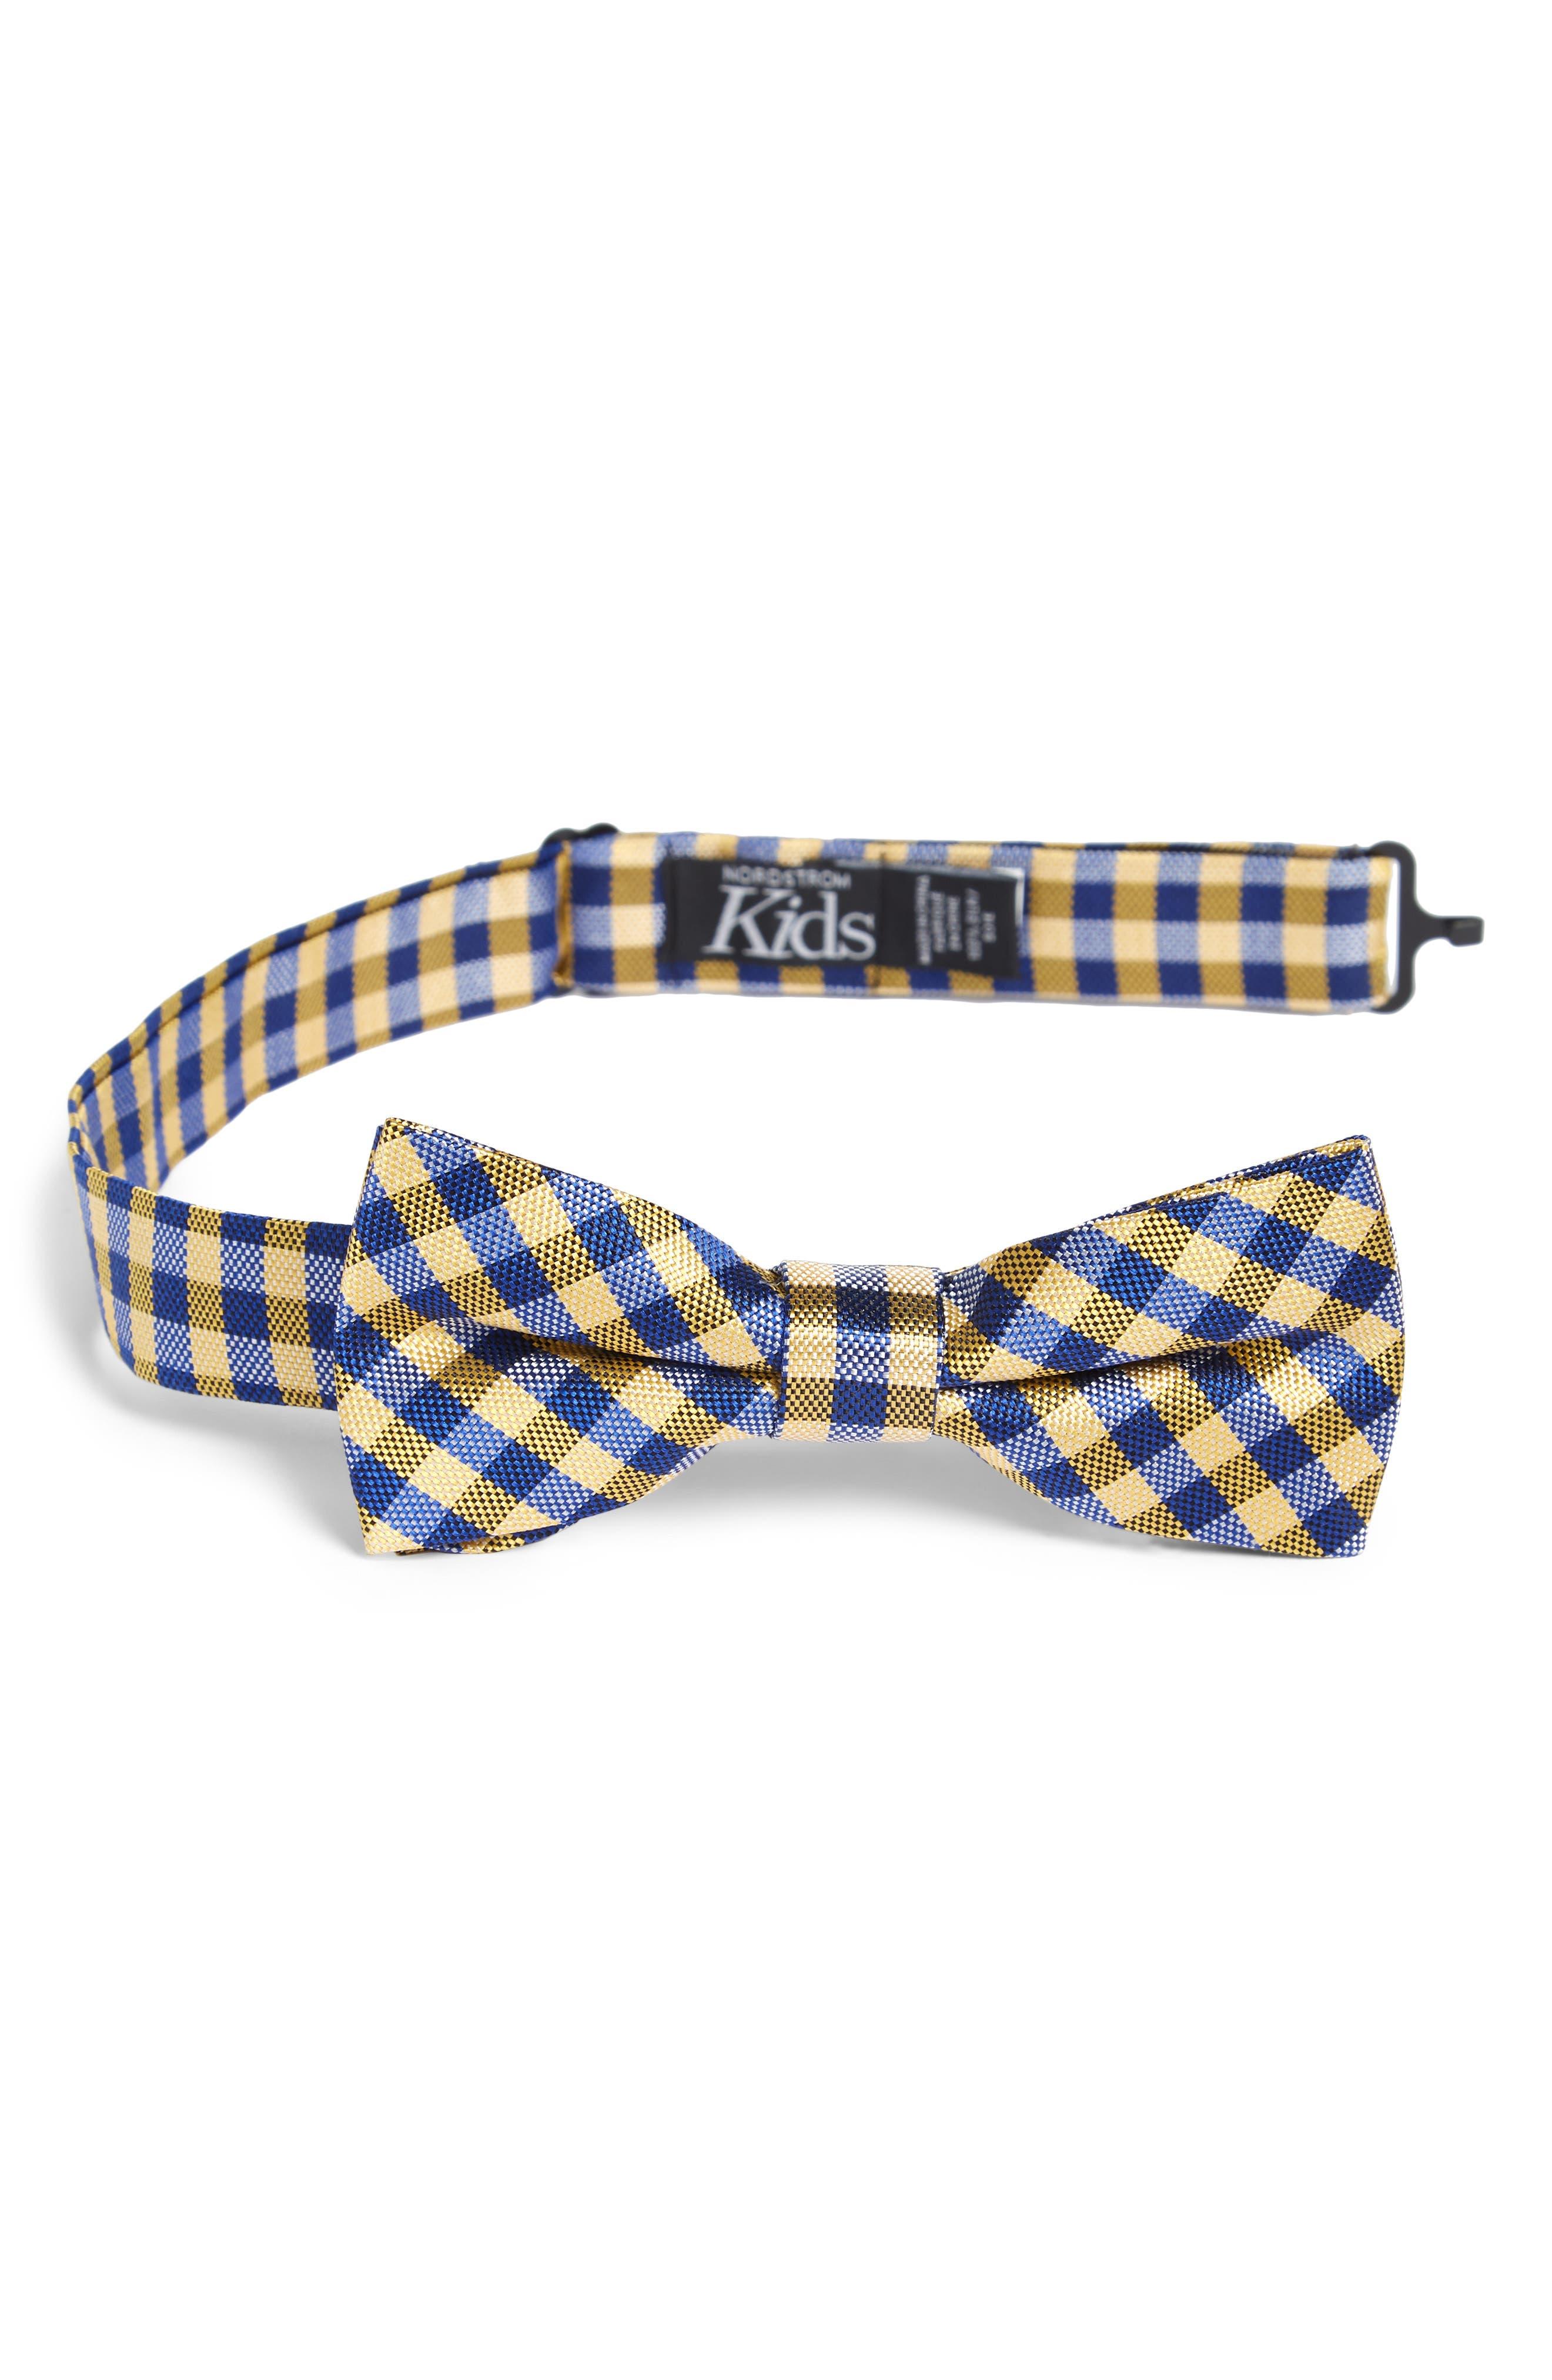 NORDSTROM Plaid Silk Bow Tie, Main, color, 700